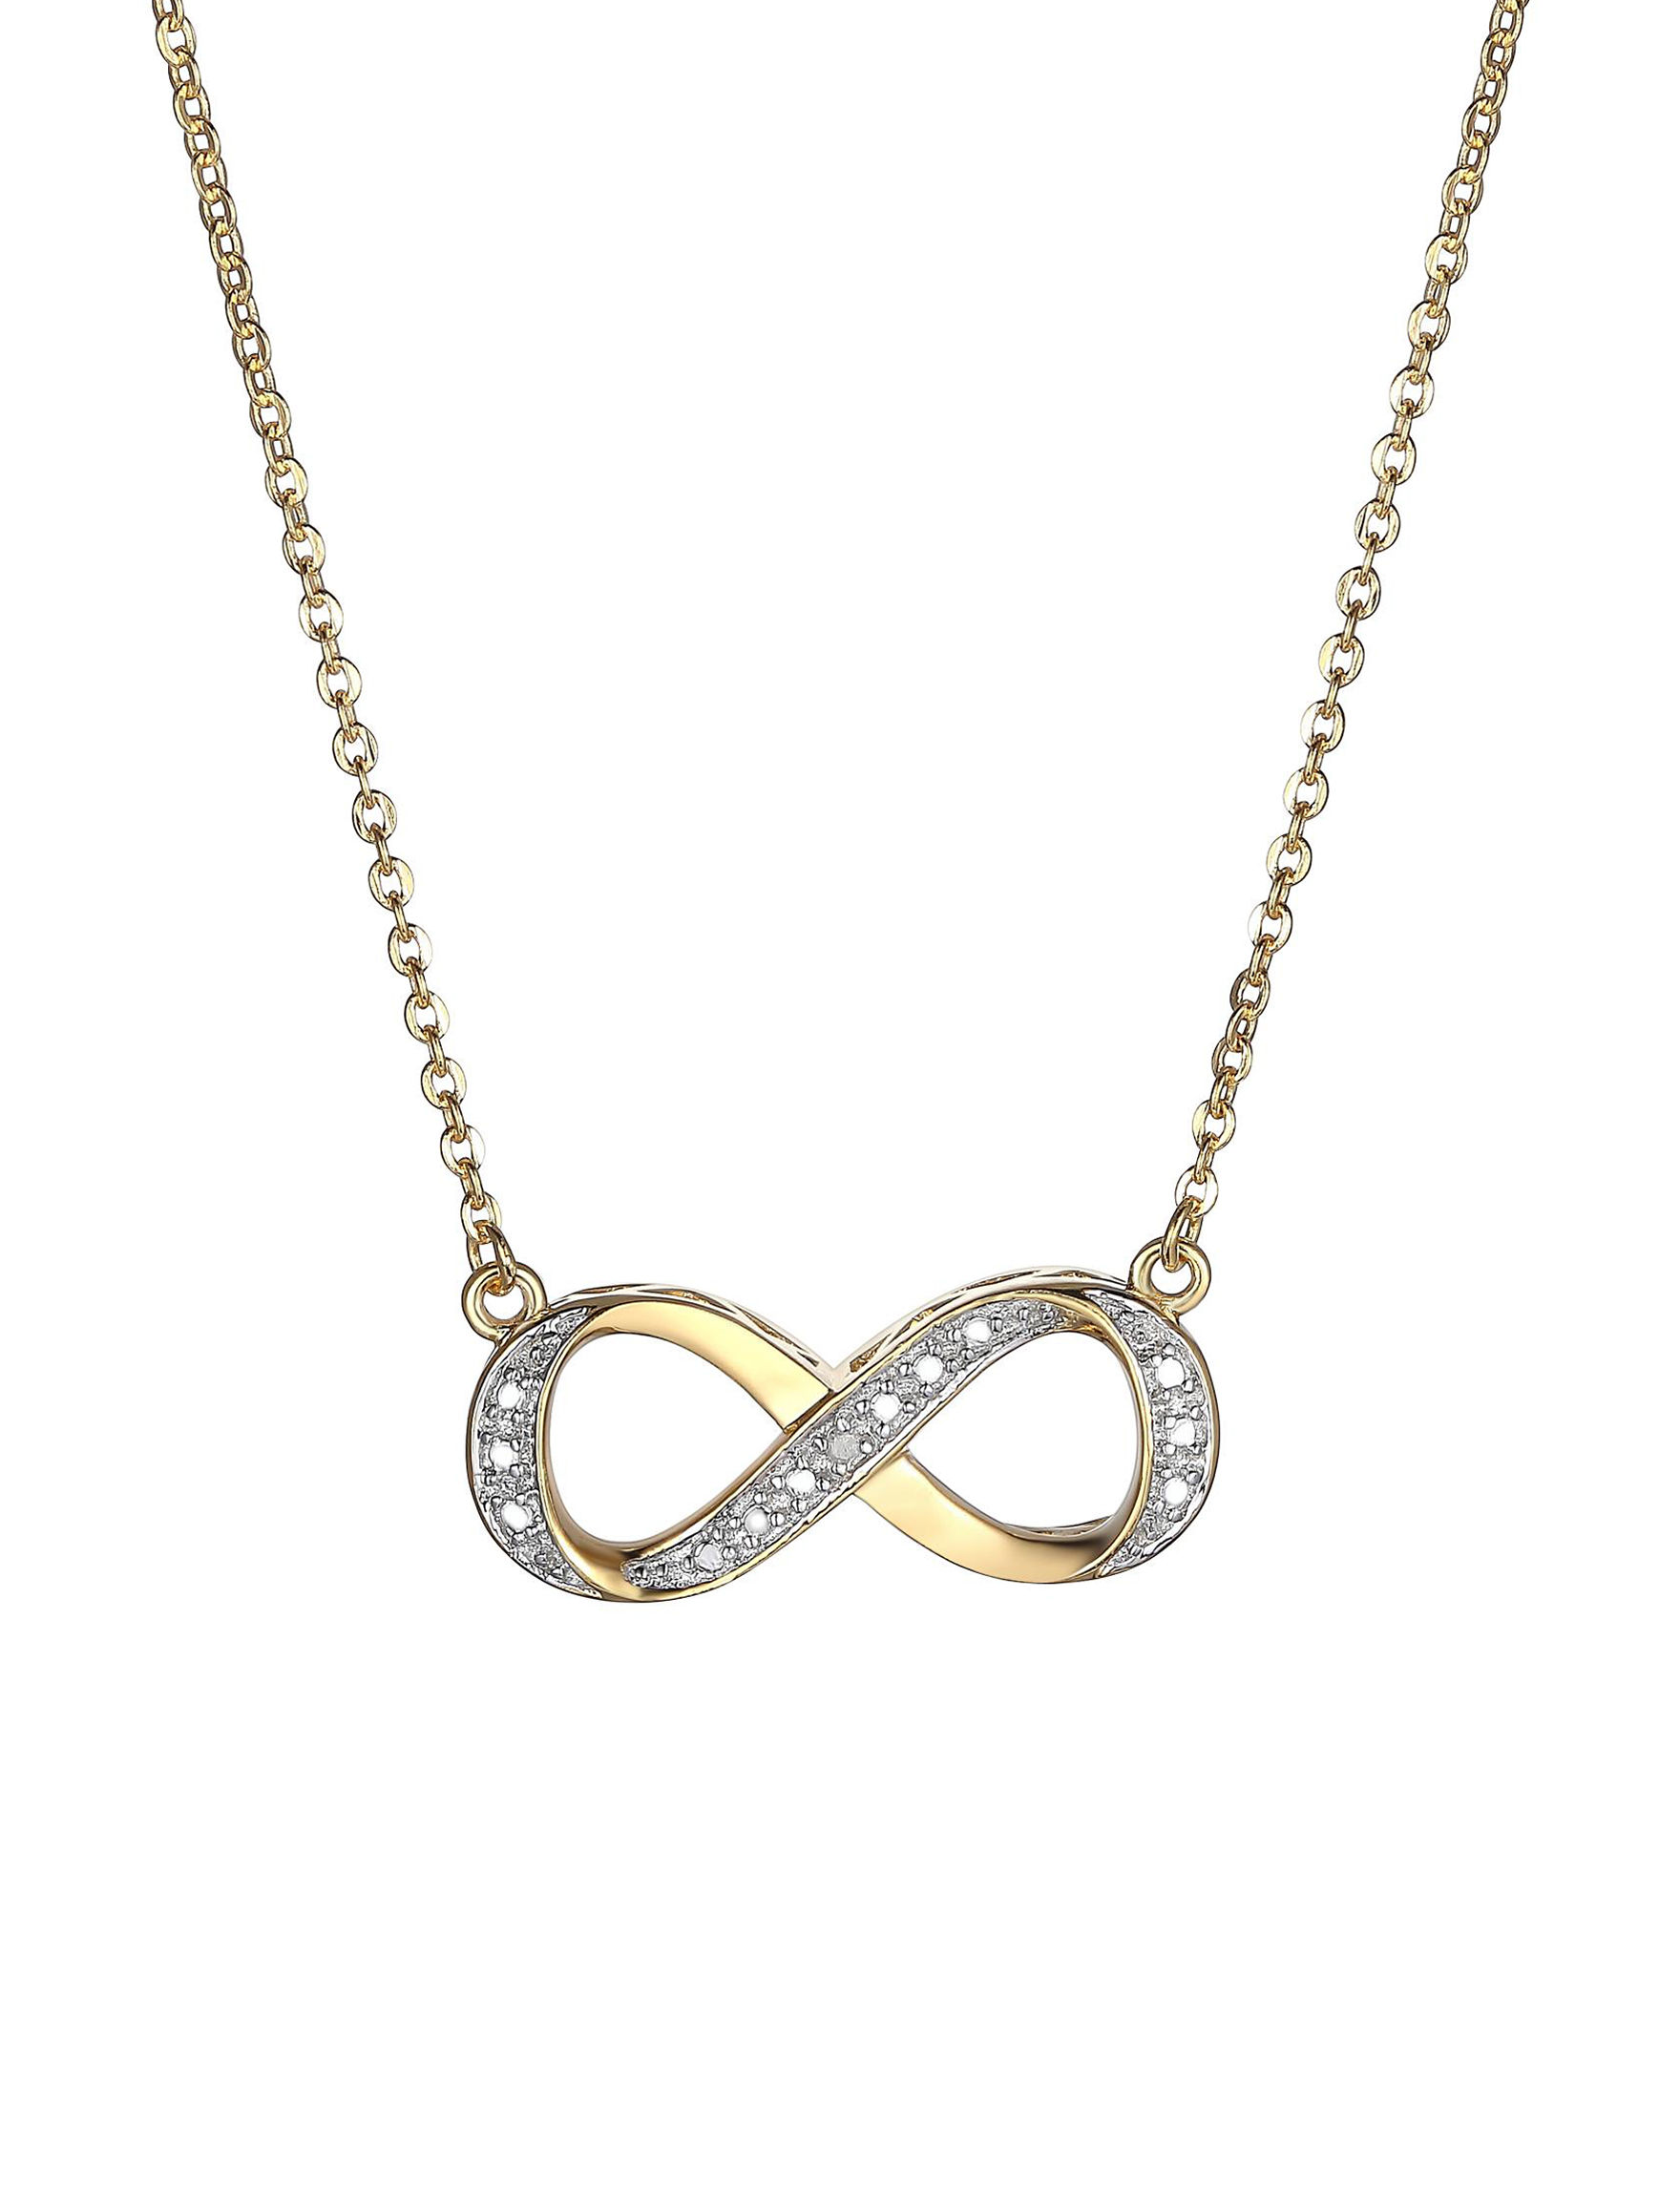 PAJ INC. White Gold Necklaces & Pendants Fine Jewelry